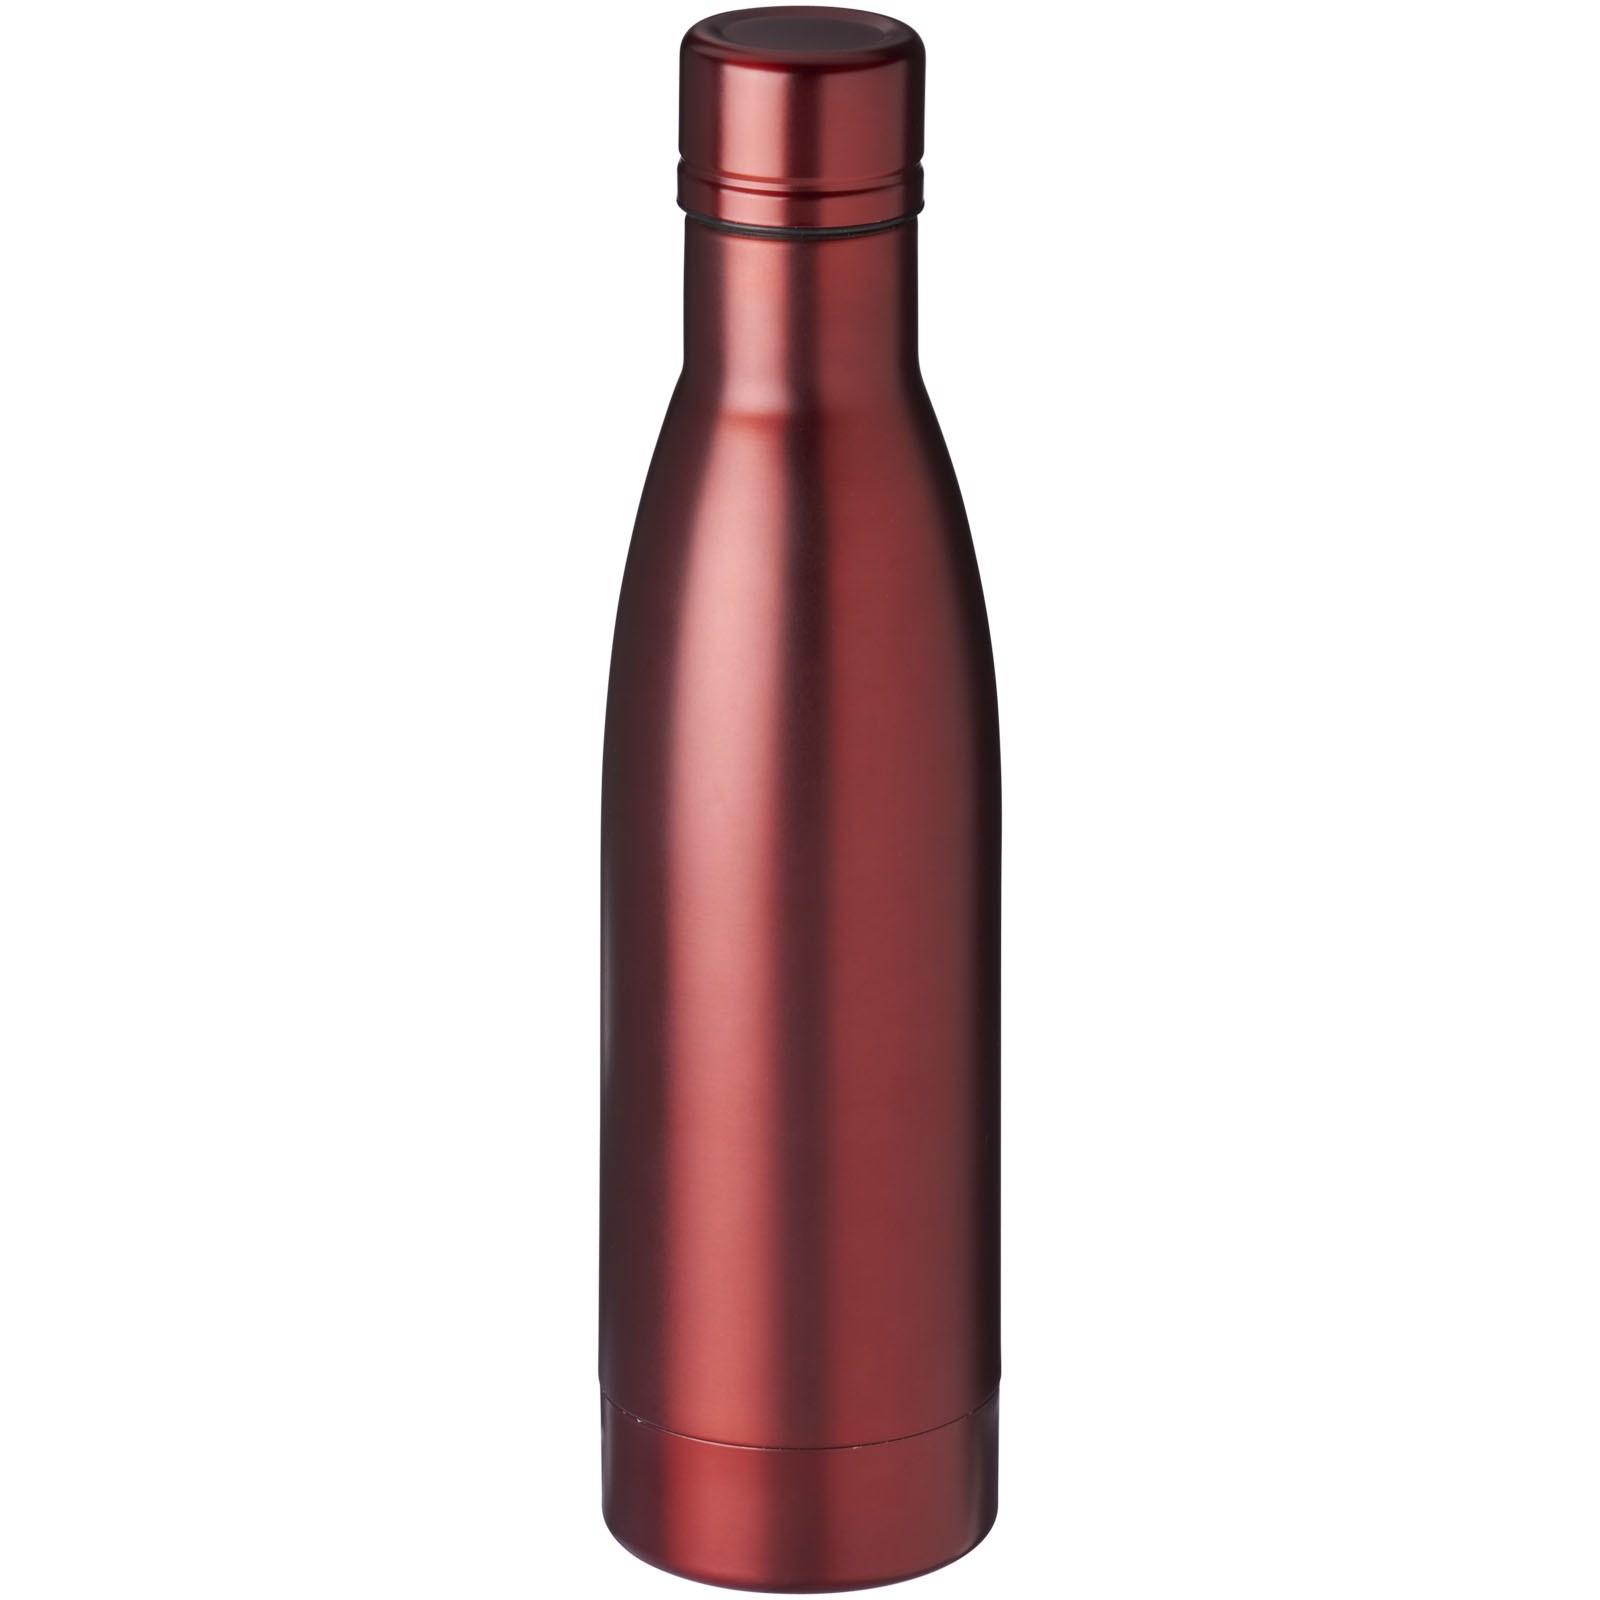 Vasa 500 ml copper vacuum insulated sport bottle - Red